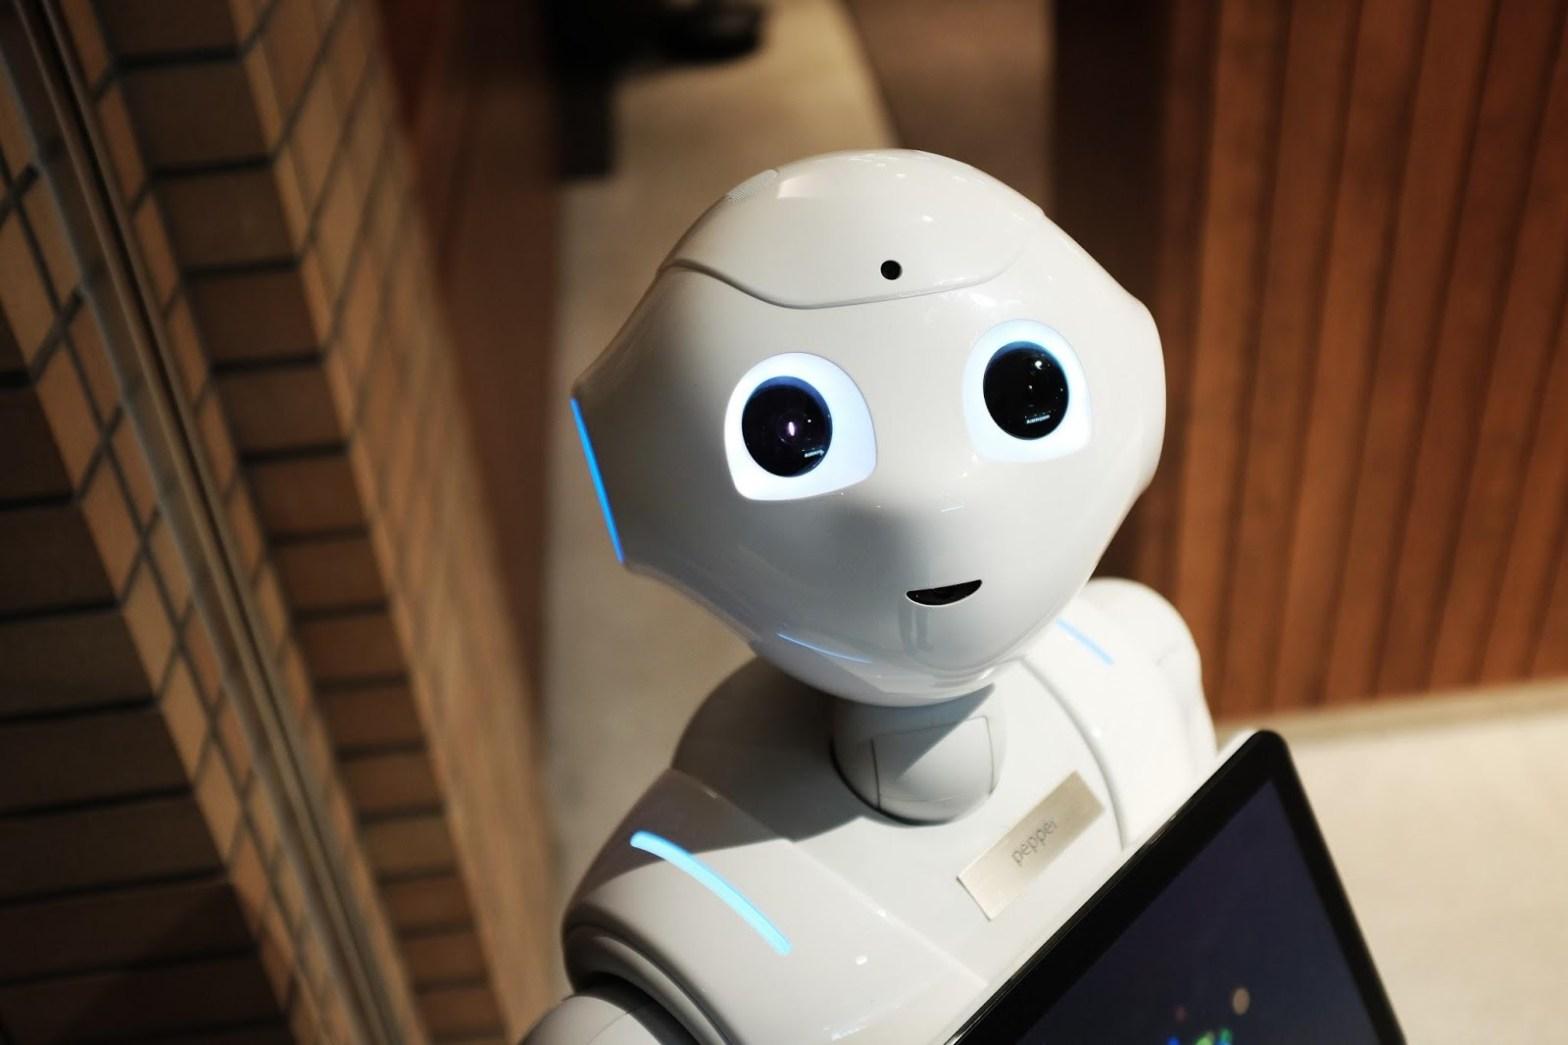 AI-based HR